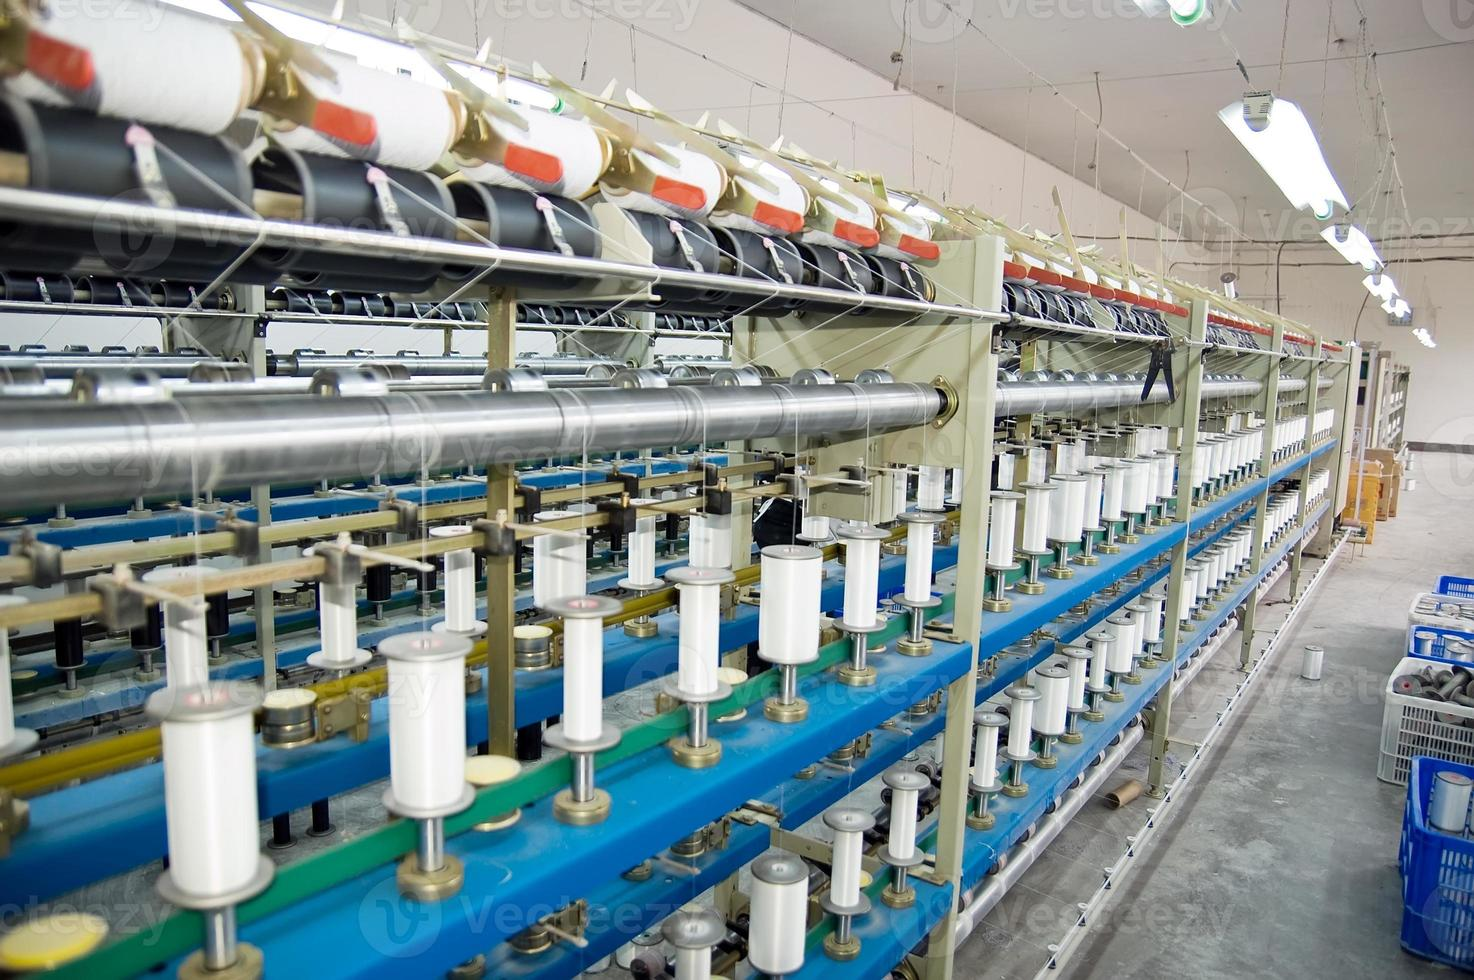 fabrica textil foto